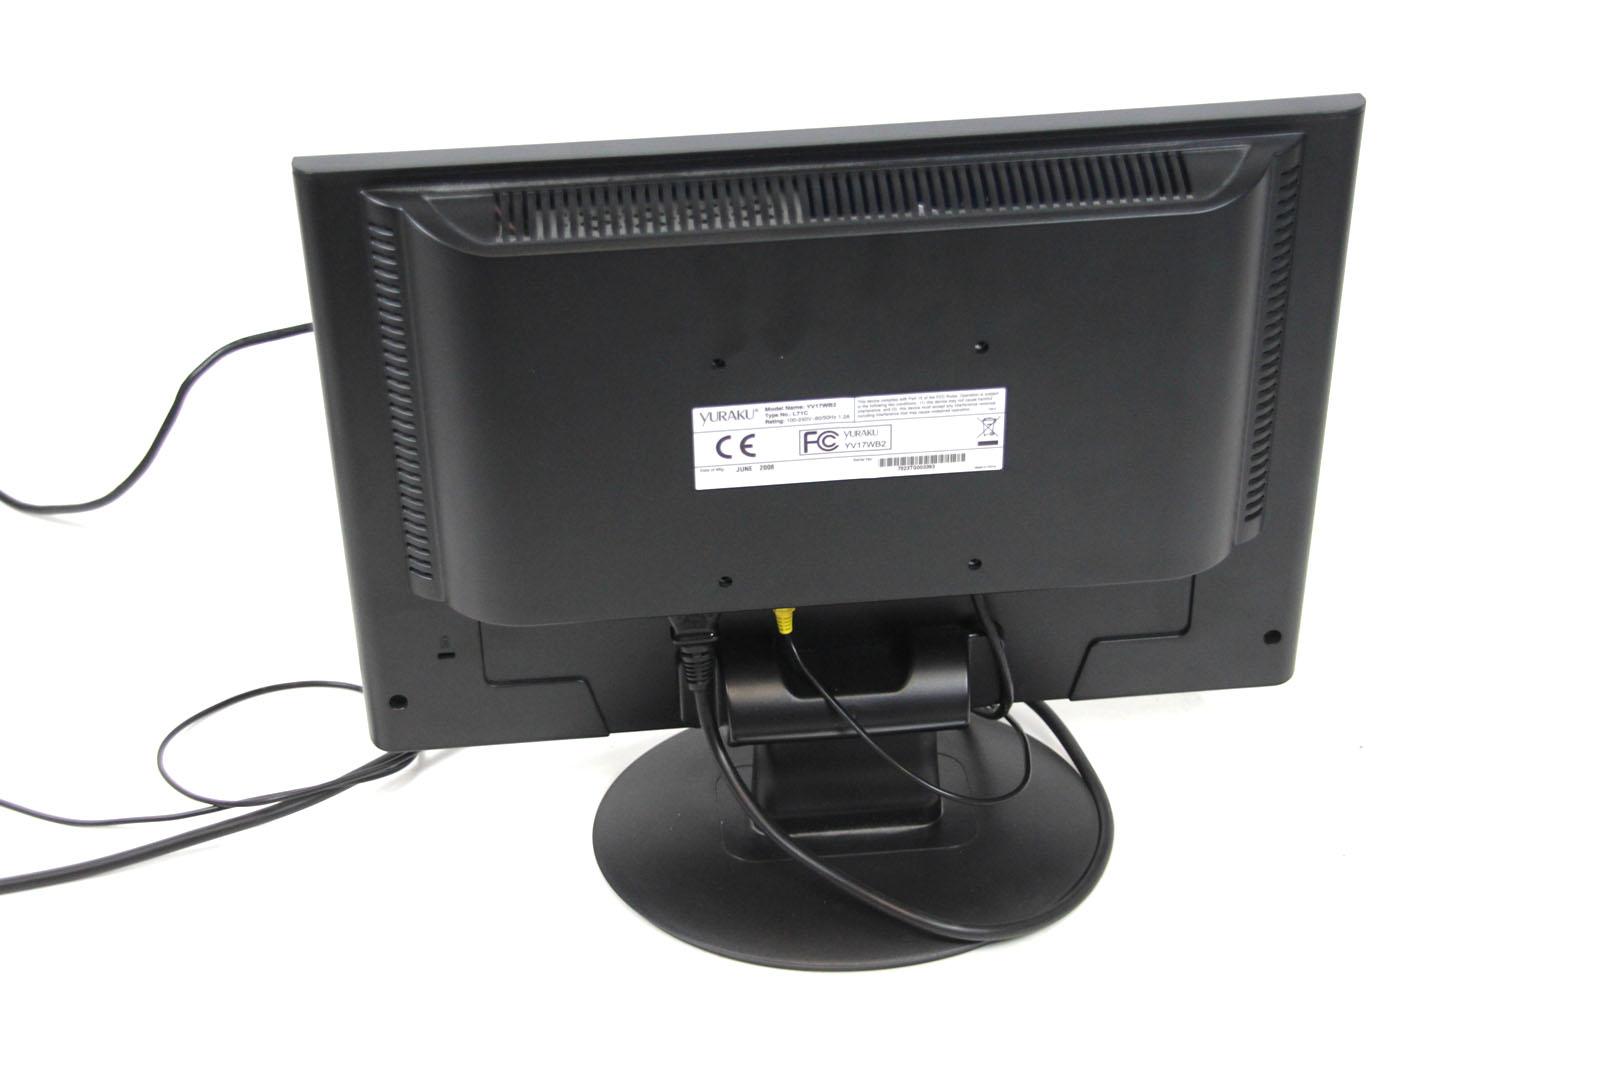 yuraku yv17wb2 17 monitor bildschirm. Black Bedroom Furniture Sets. Home Design Ideas